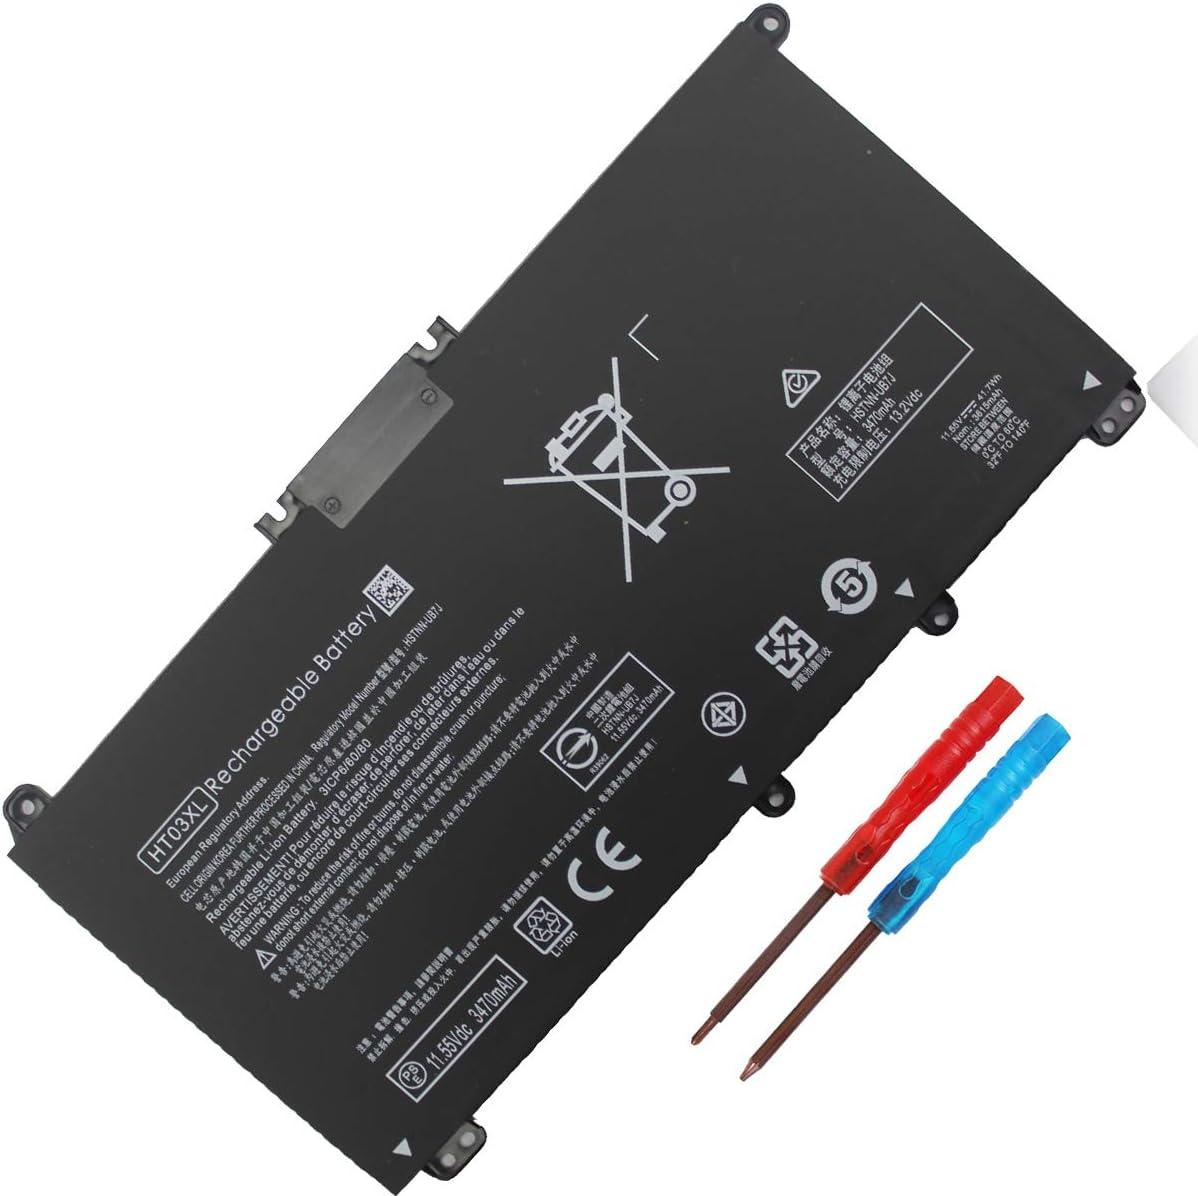 HT03XL Laptop Battery Compatible with HP Pavilion 14-CE 14-CF 14-CK 14-cm 14-DF 15-CS 15-CW 15-DA 15-DB 17-by 240 245 250 255 G7 340 348 G5 L11421-422 L11119-855 HSTNN-UB7J HSTNN-DB8R HSTNN-DB8S